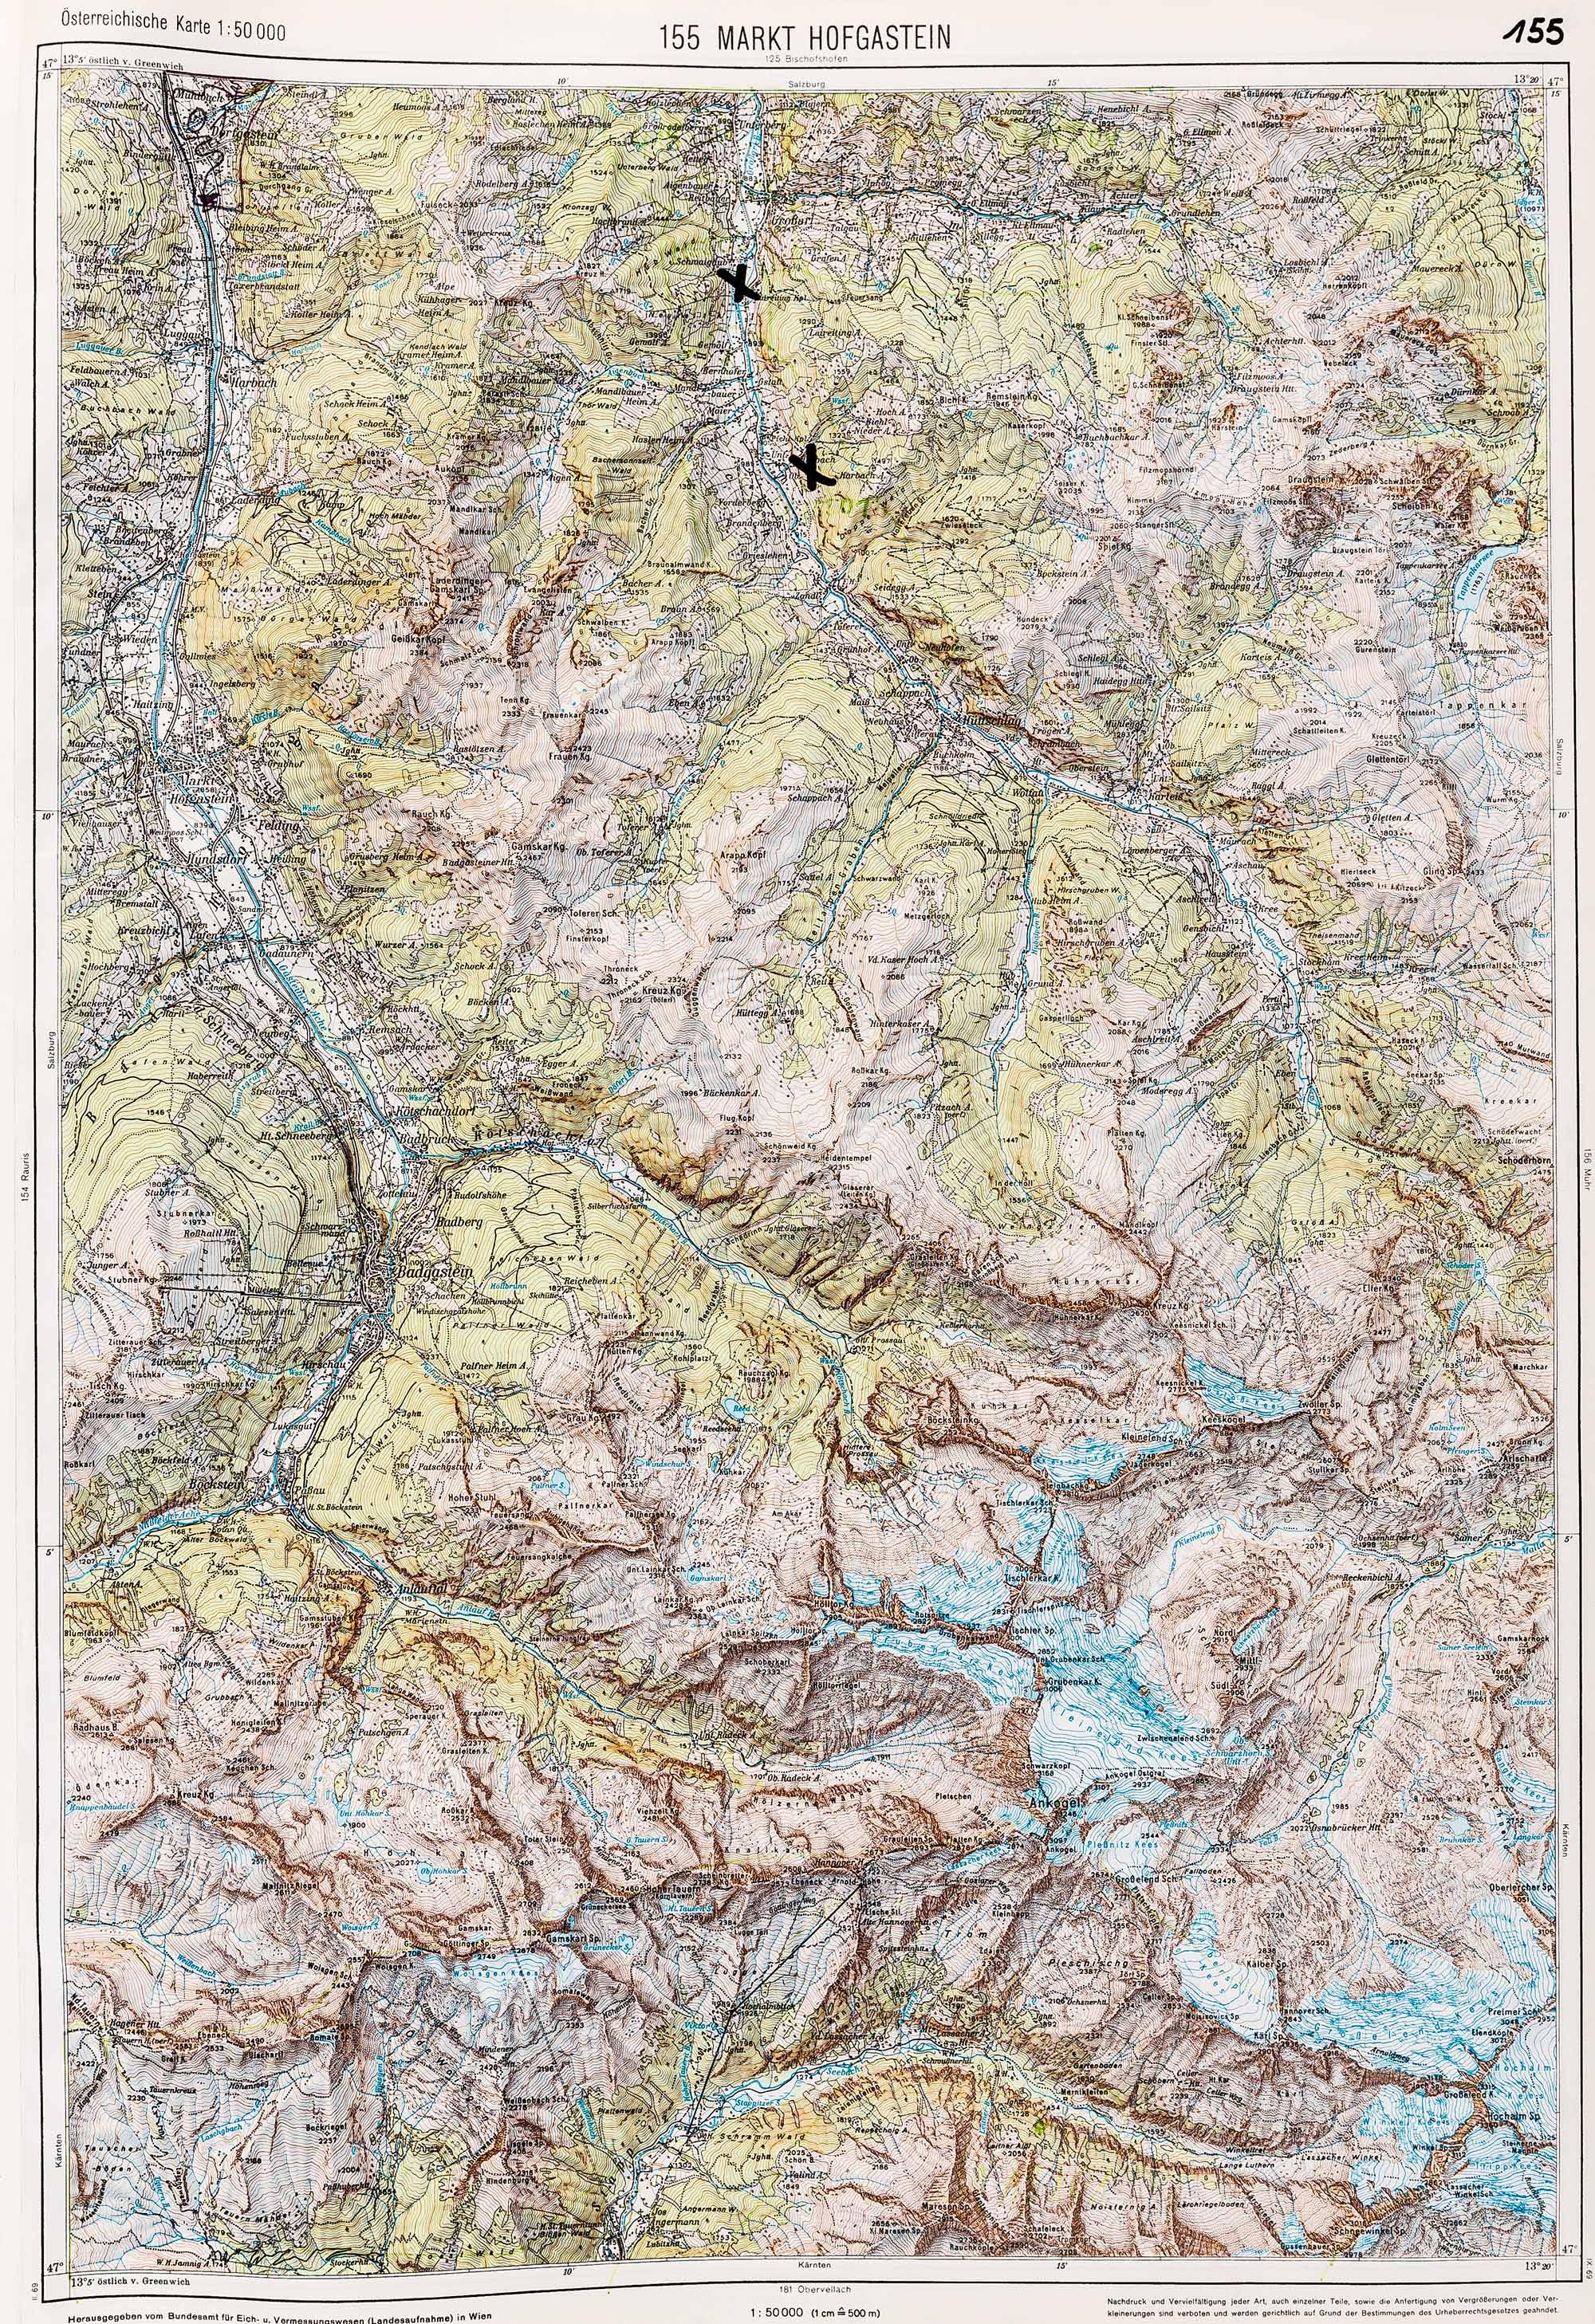 1983-1986 Karte 155